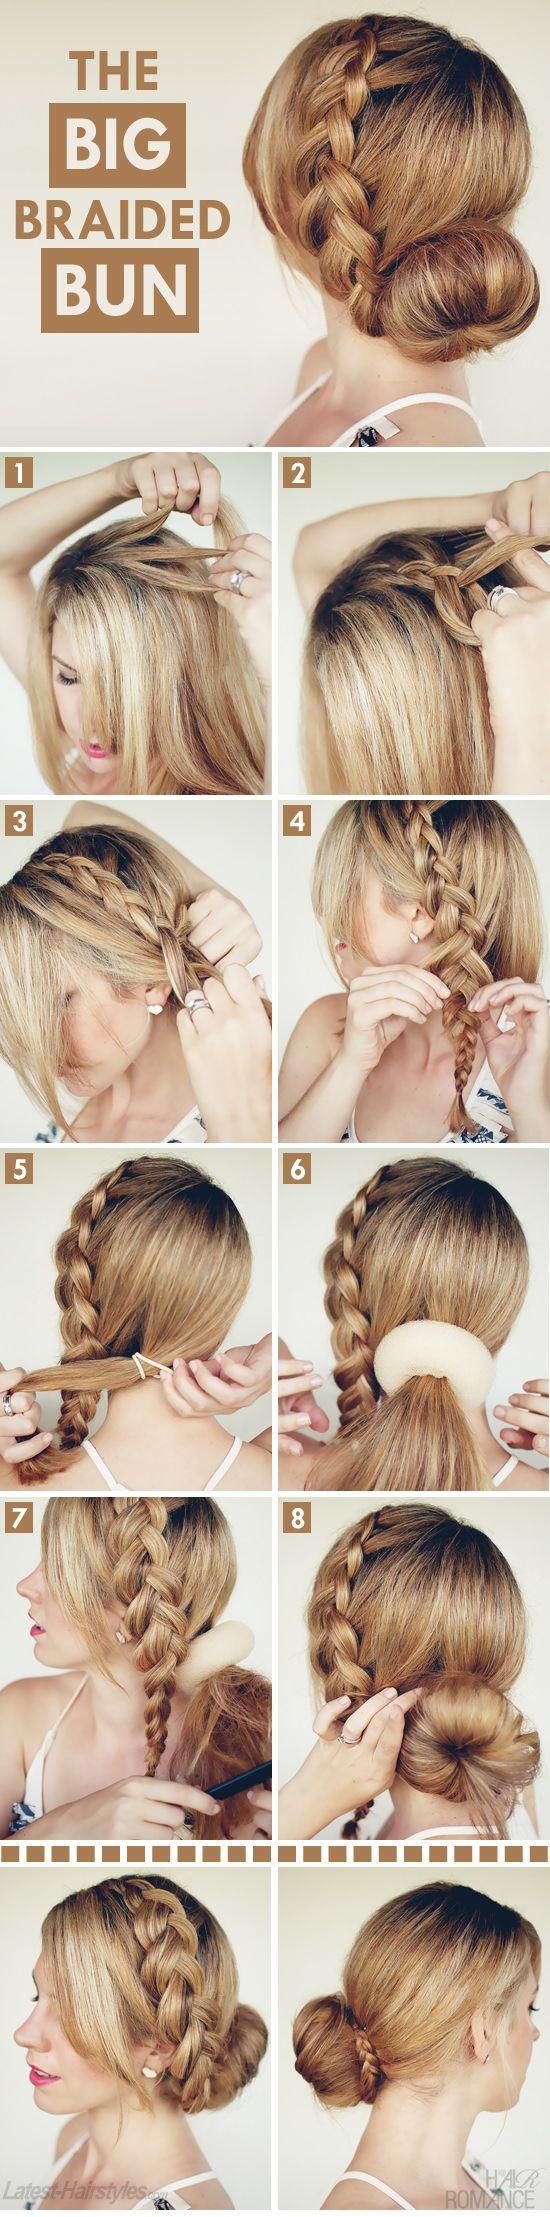 hair ideas  Board